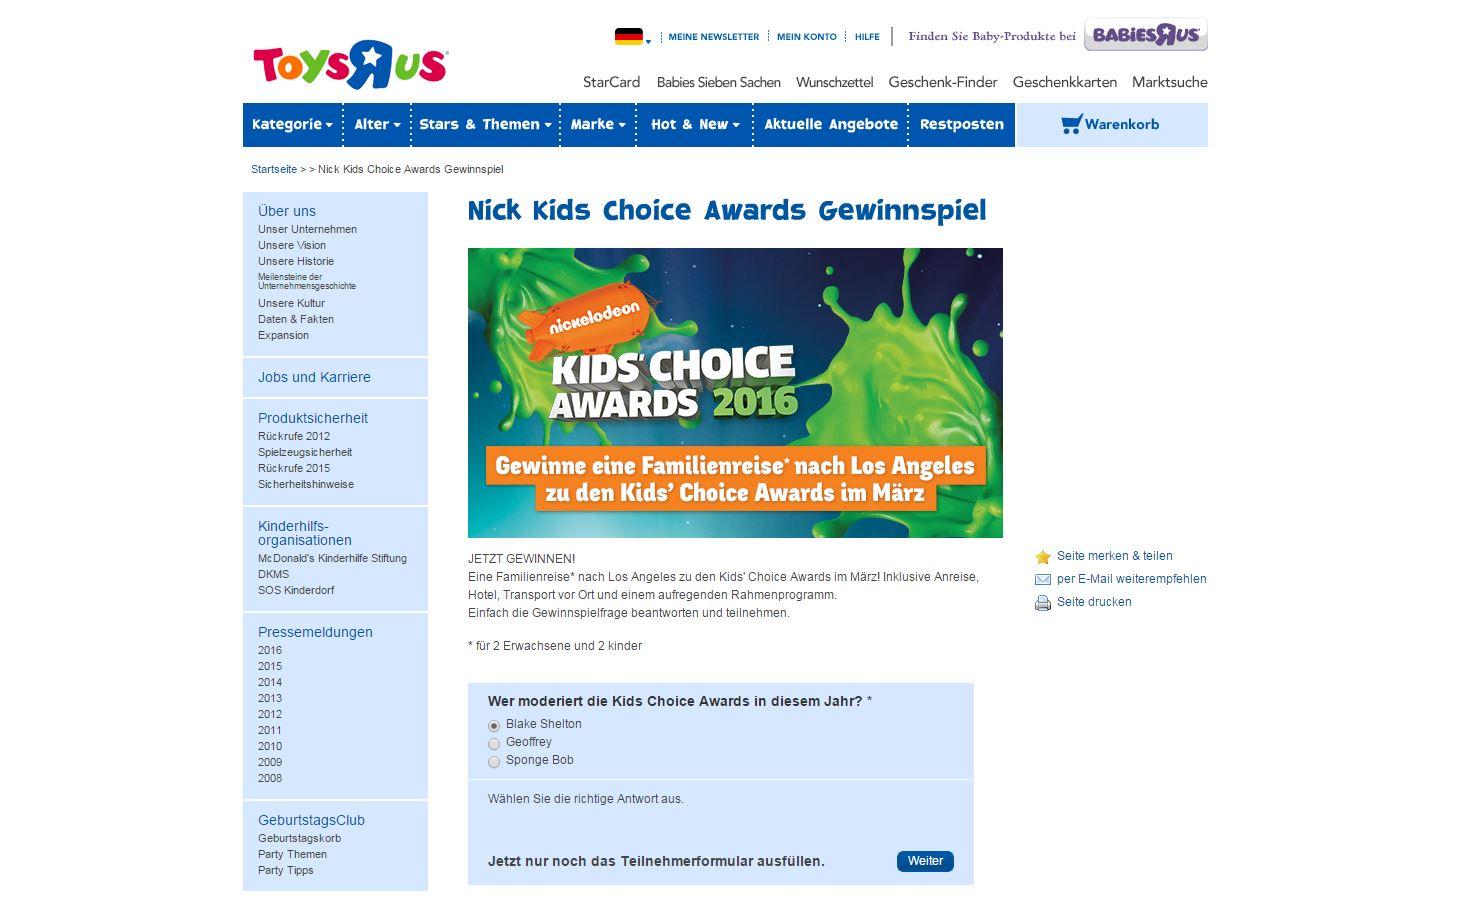 toys r us kids 39 choice awards reise gewinnspiel. Black Bedroom Furniture Sets. Home Design Ideas